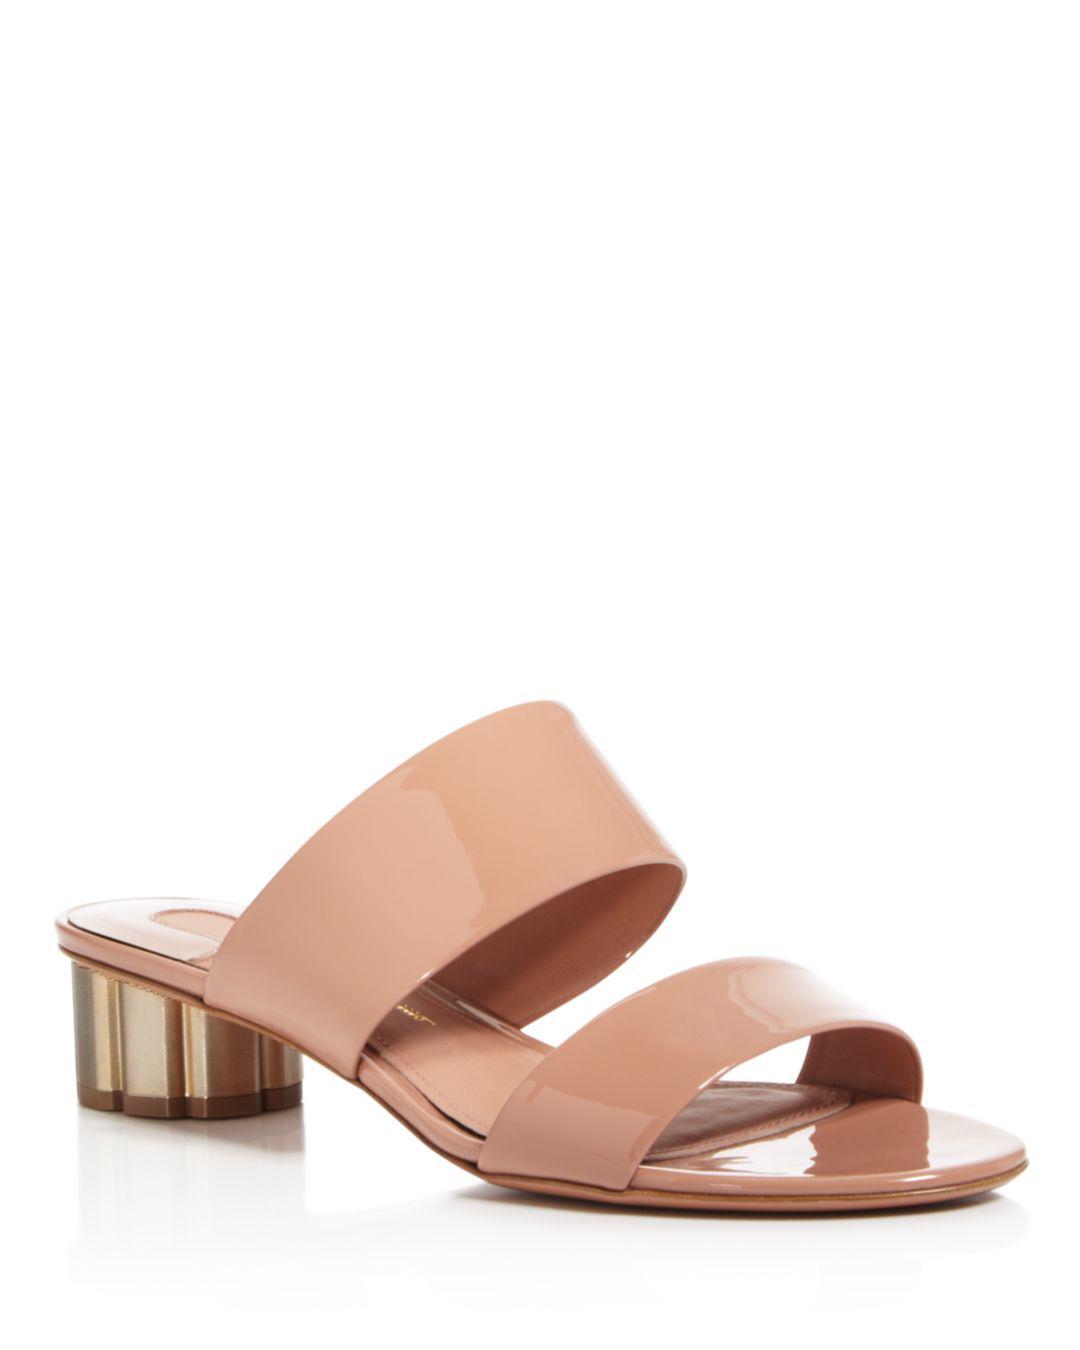 a7c12a9b62f6 Ferragamo. Women s Pink Belluno Patent Leather Slide Sandals